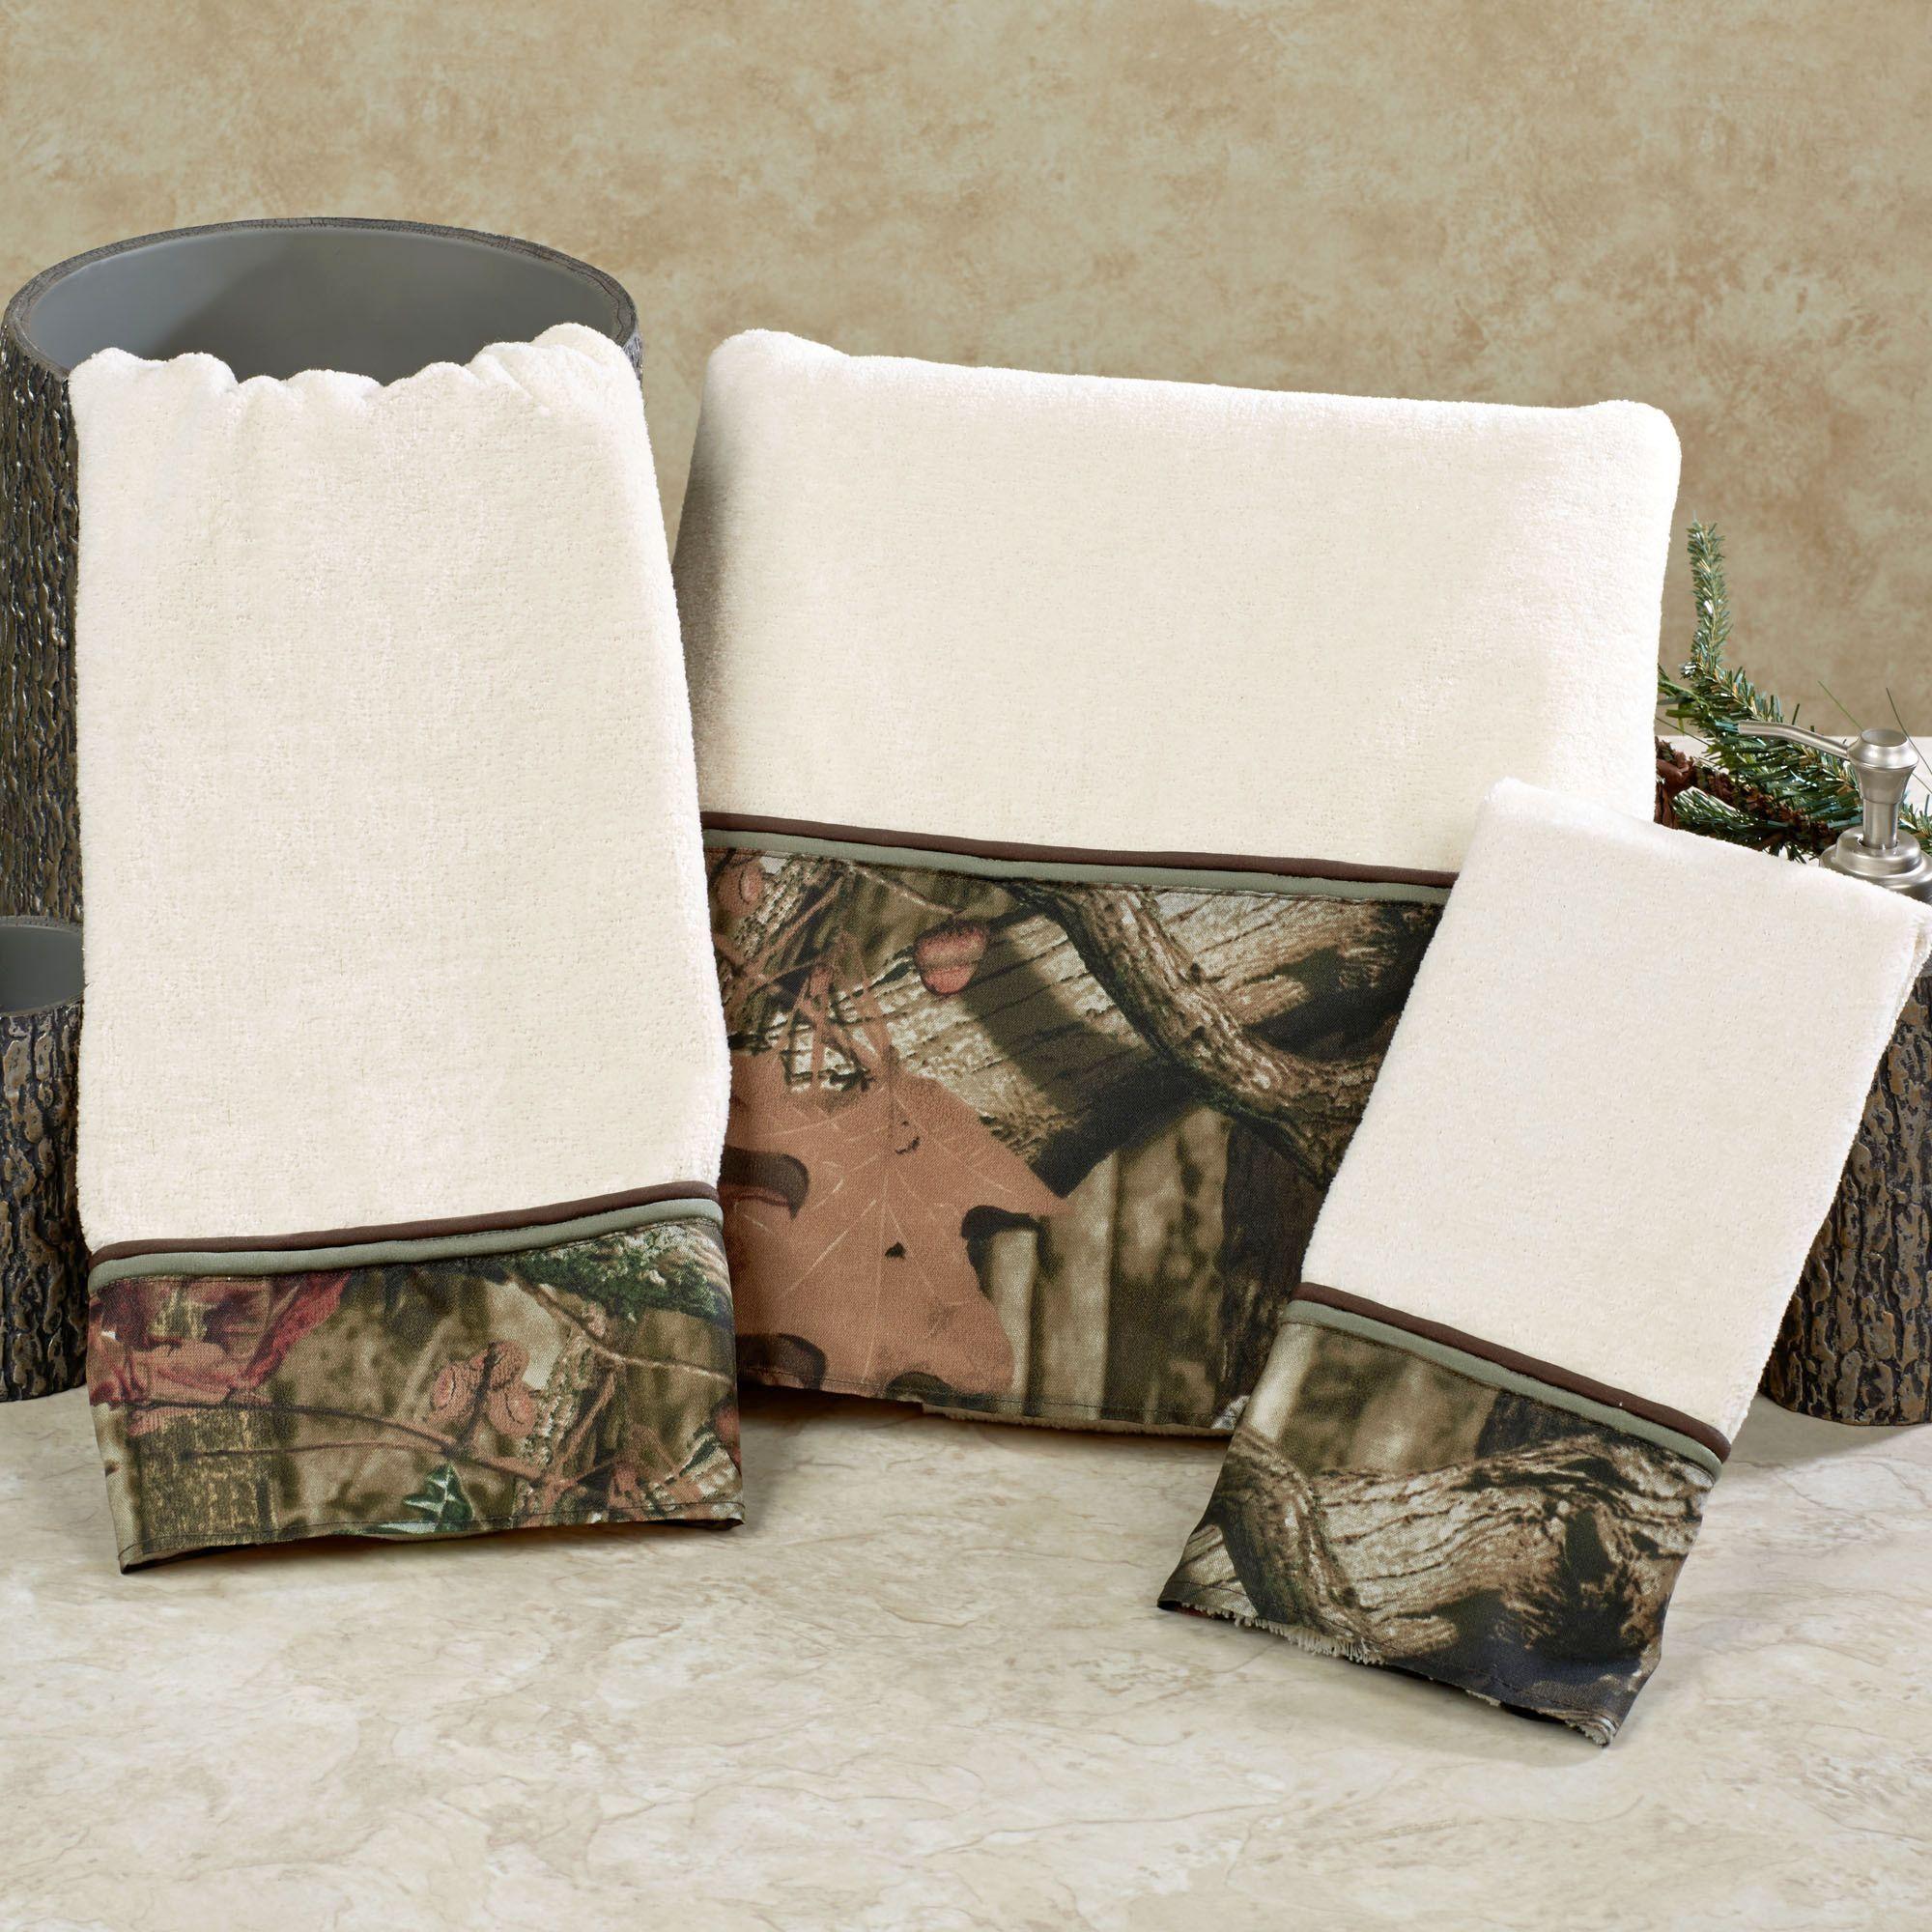 Camouflage Bath Towels With Images Camo Bath Towel Set Bath